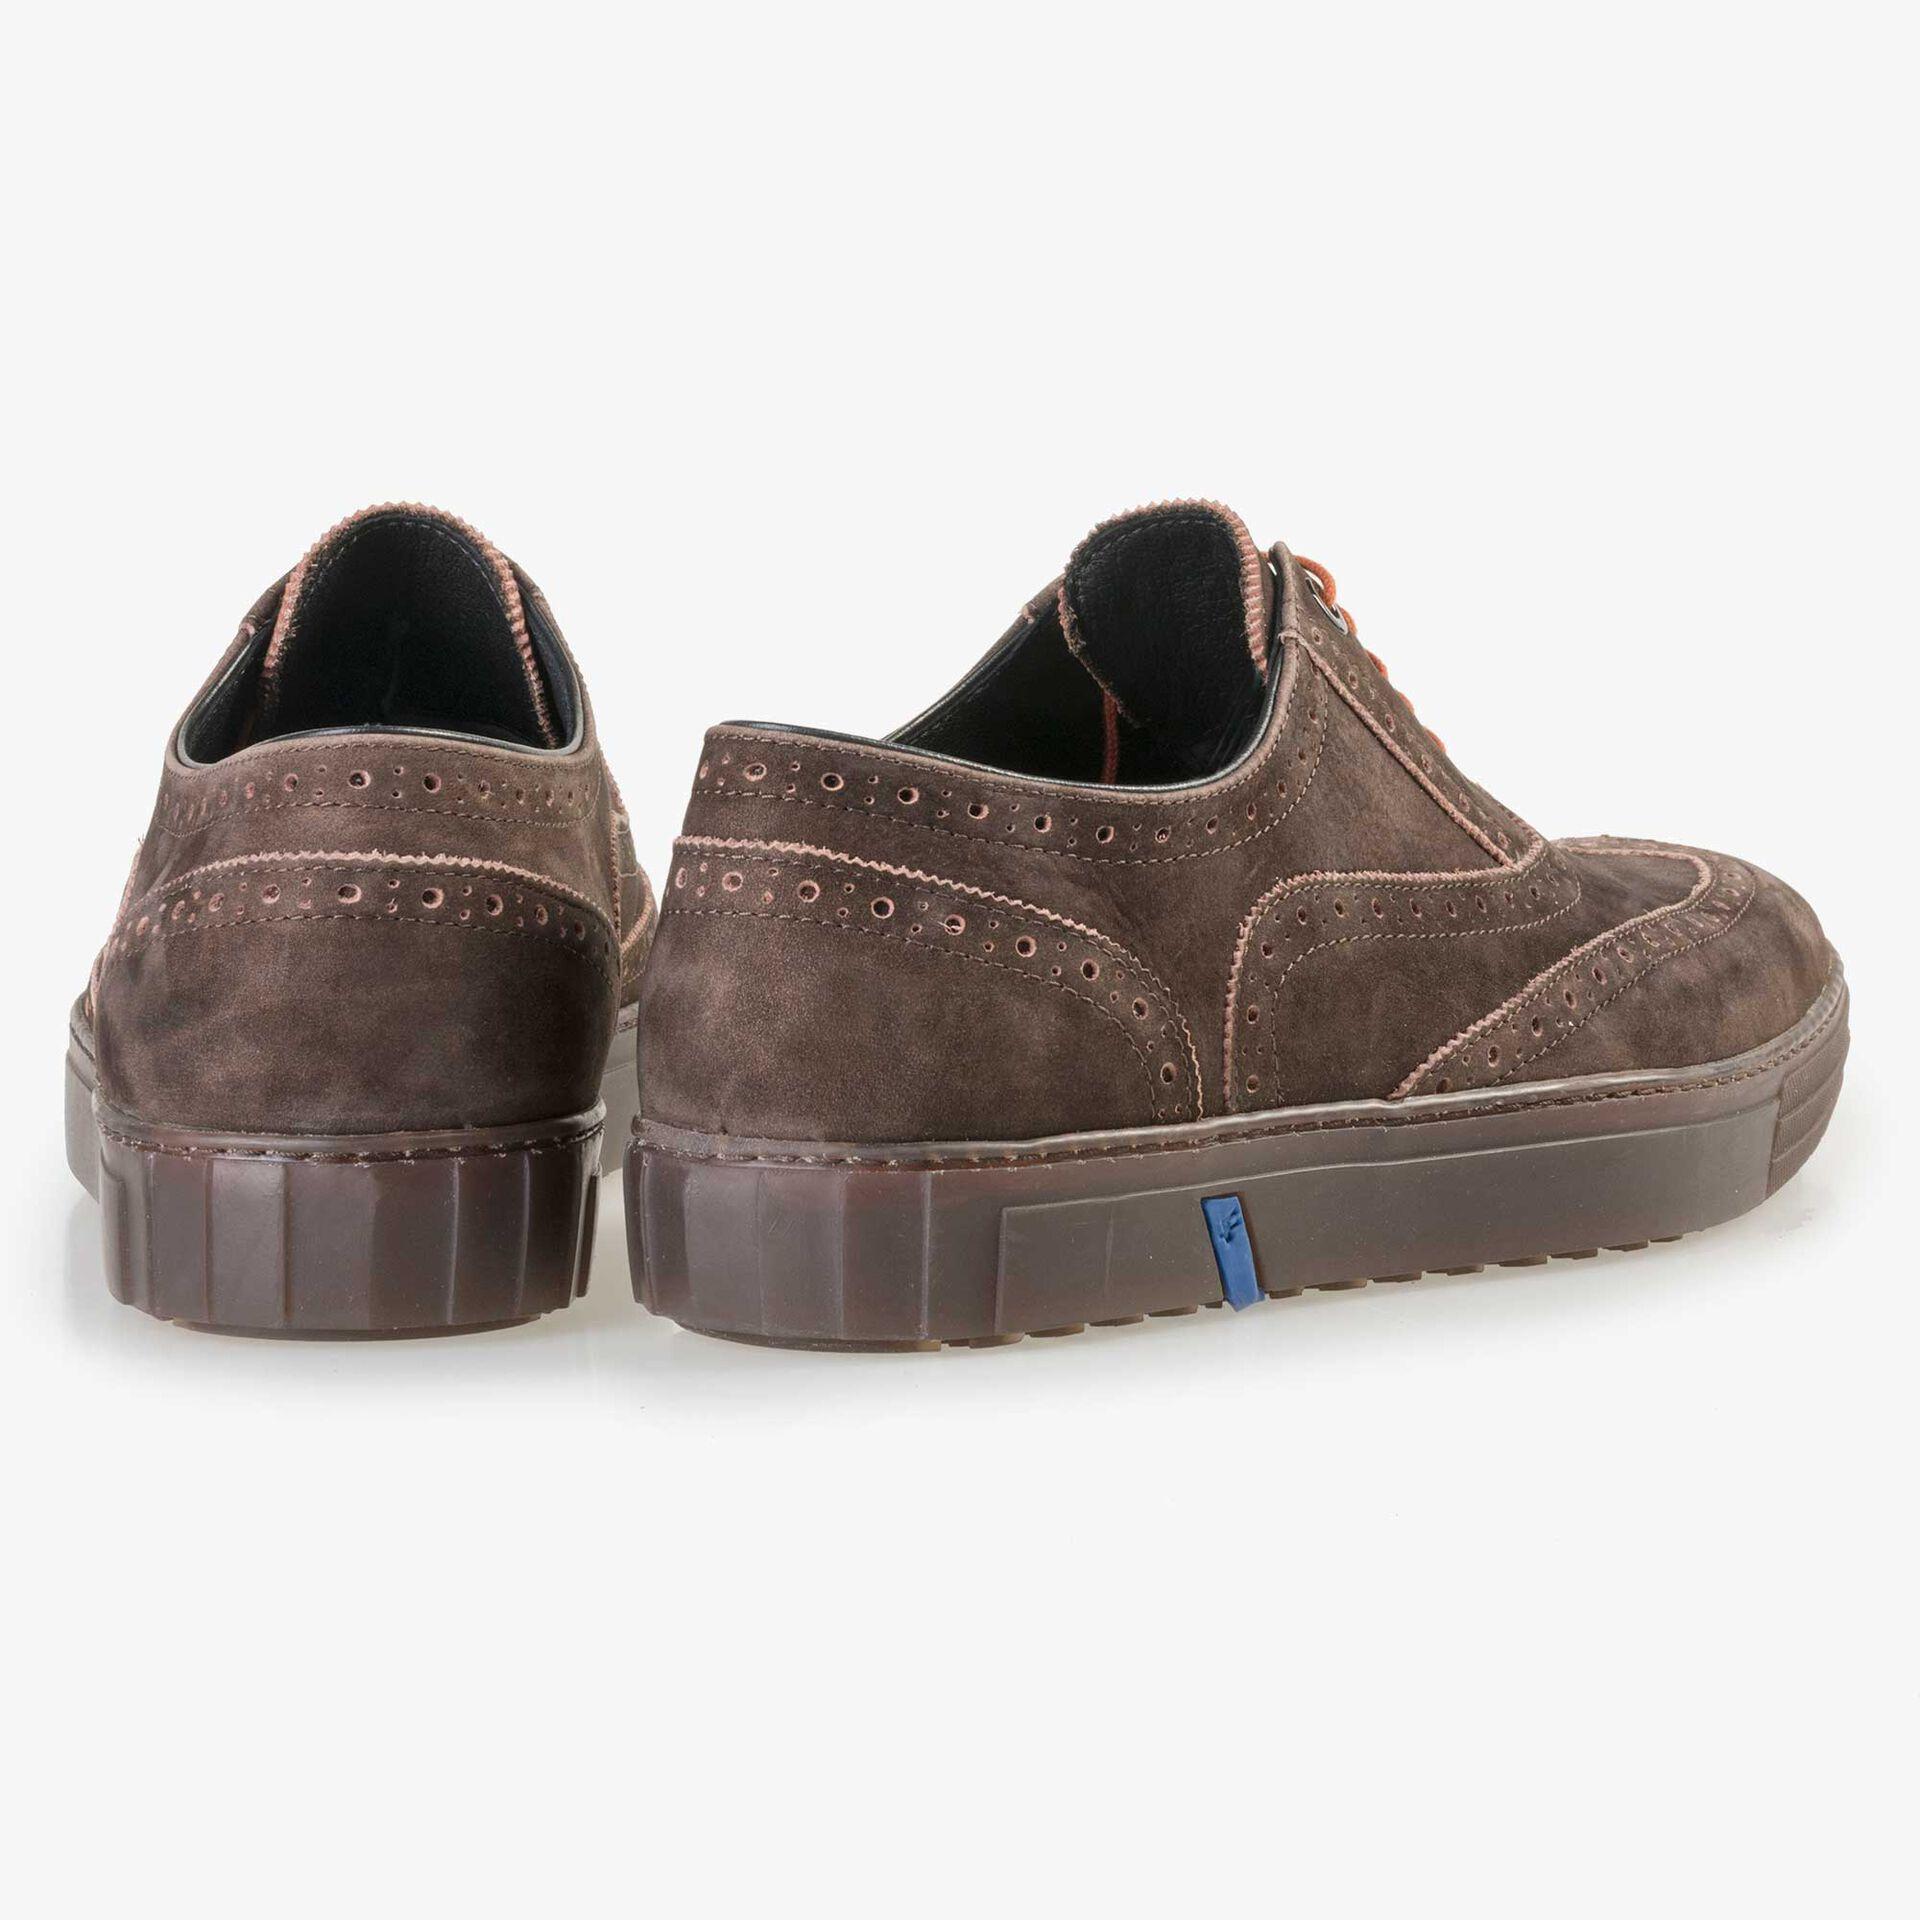 Floris van Bommel men's brown nubuck leather brogue sneaker